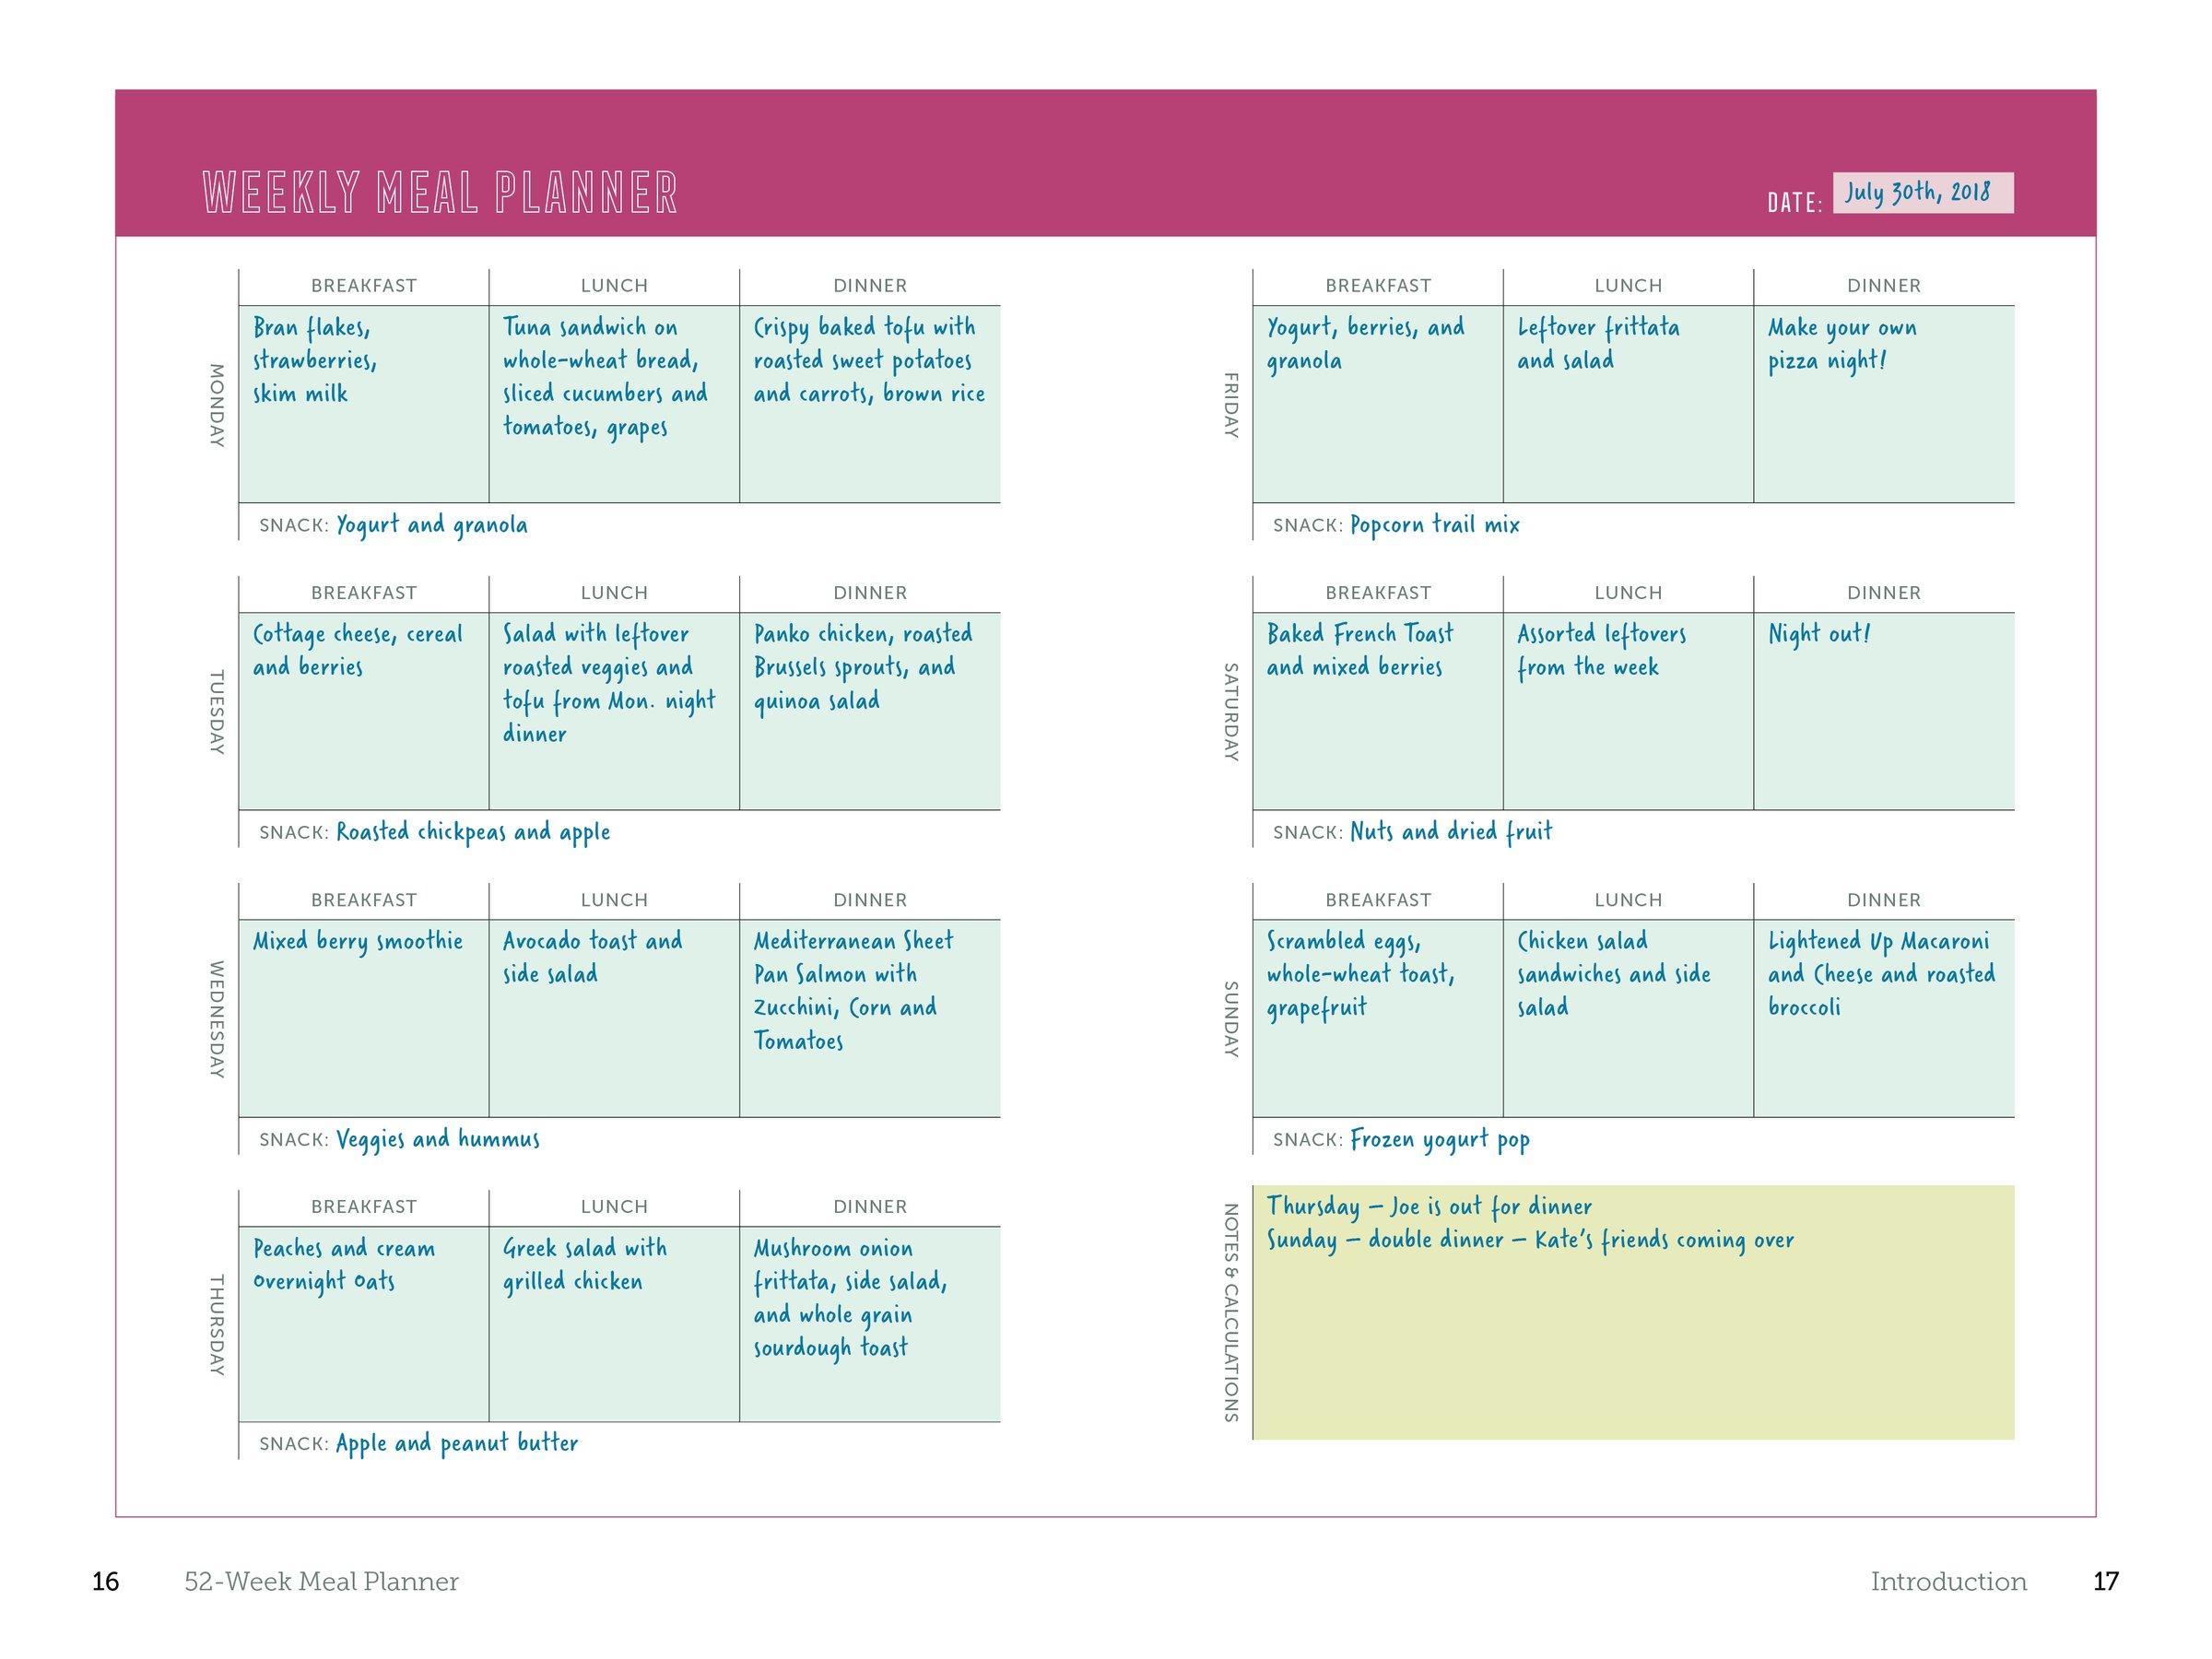 52 Week Meal Planner The Complete Guide To Planning Menus